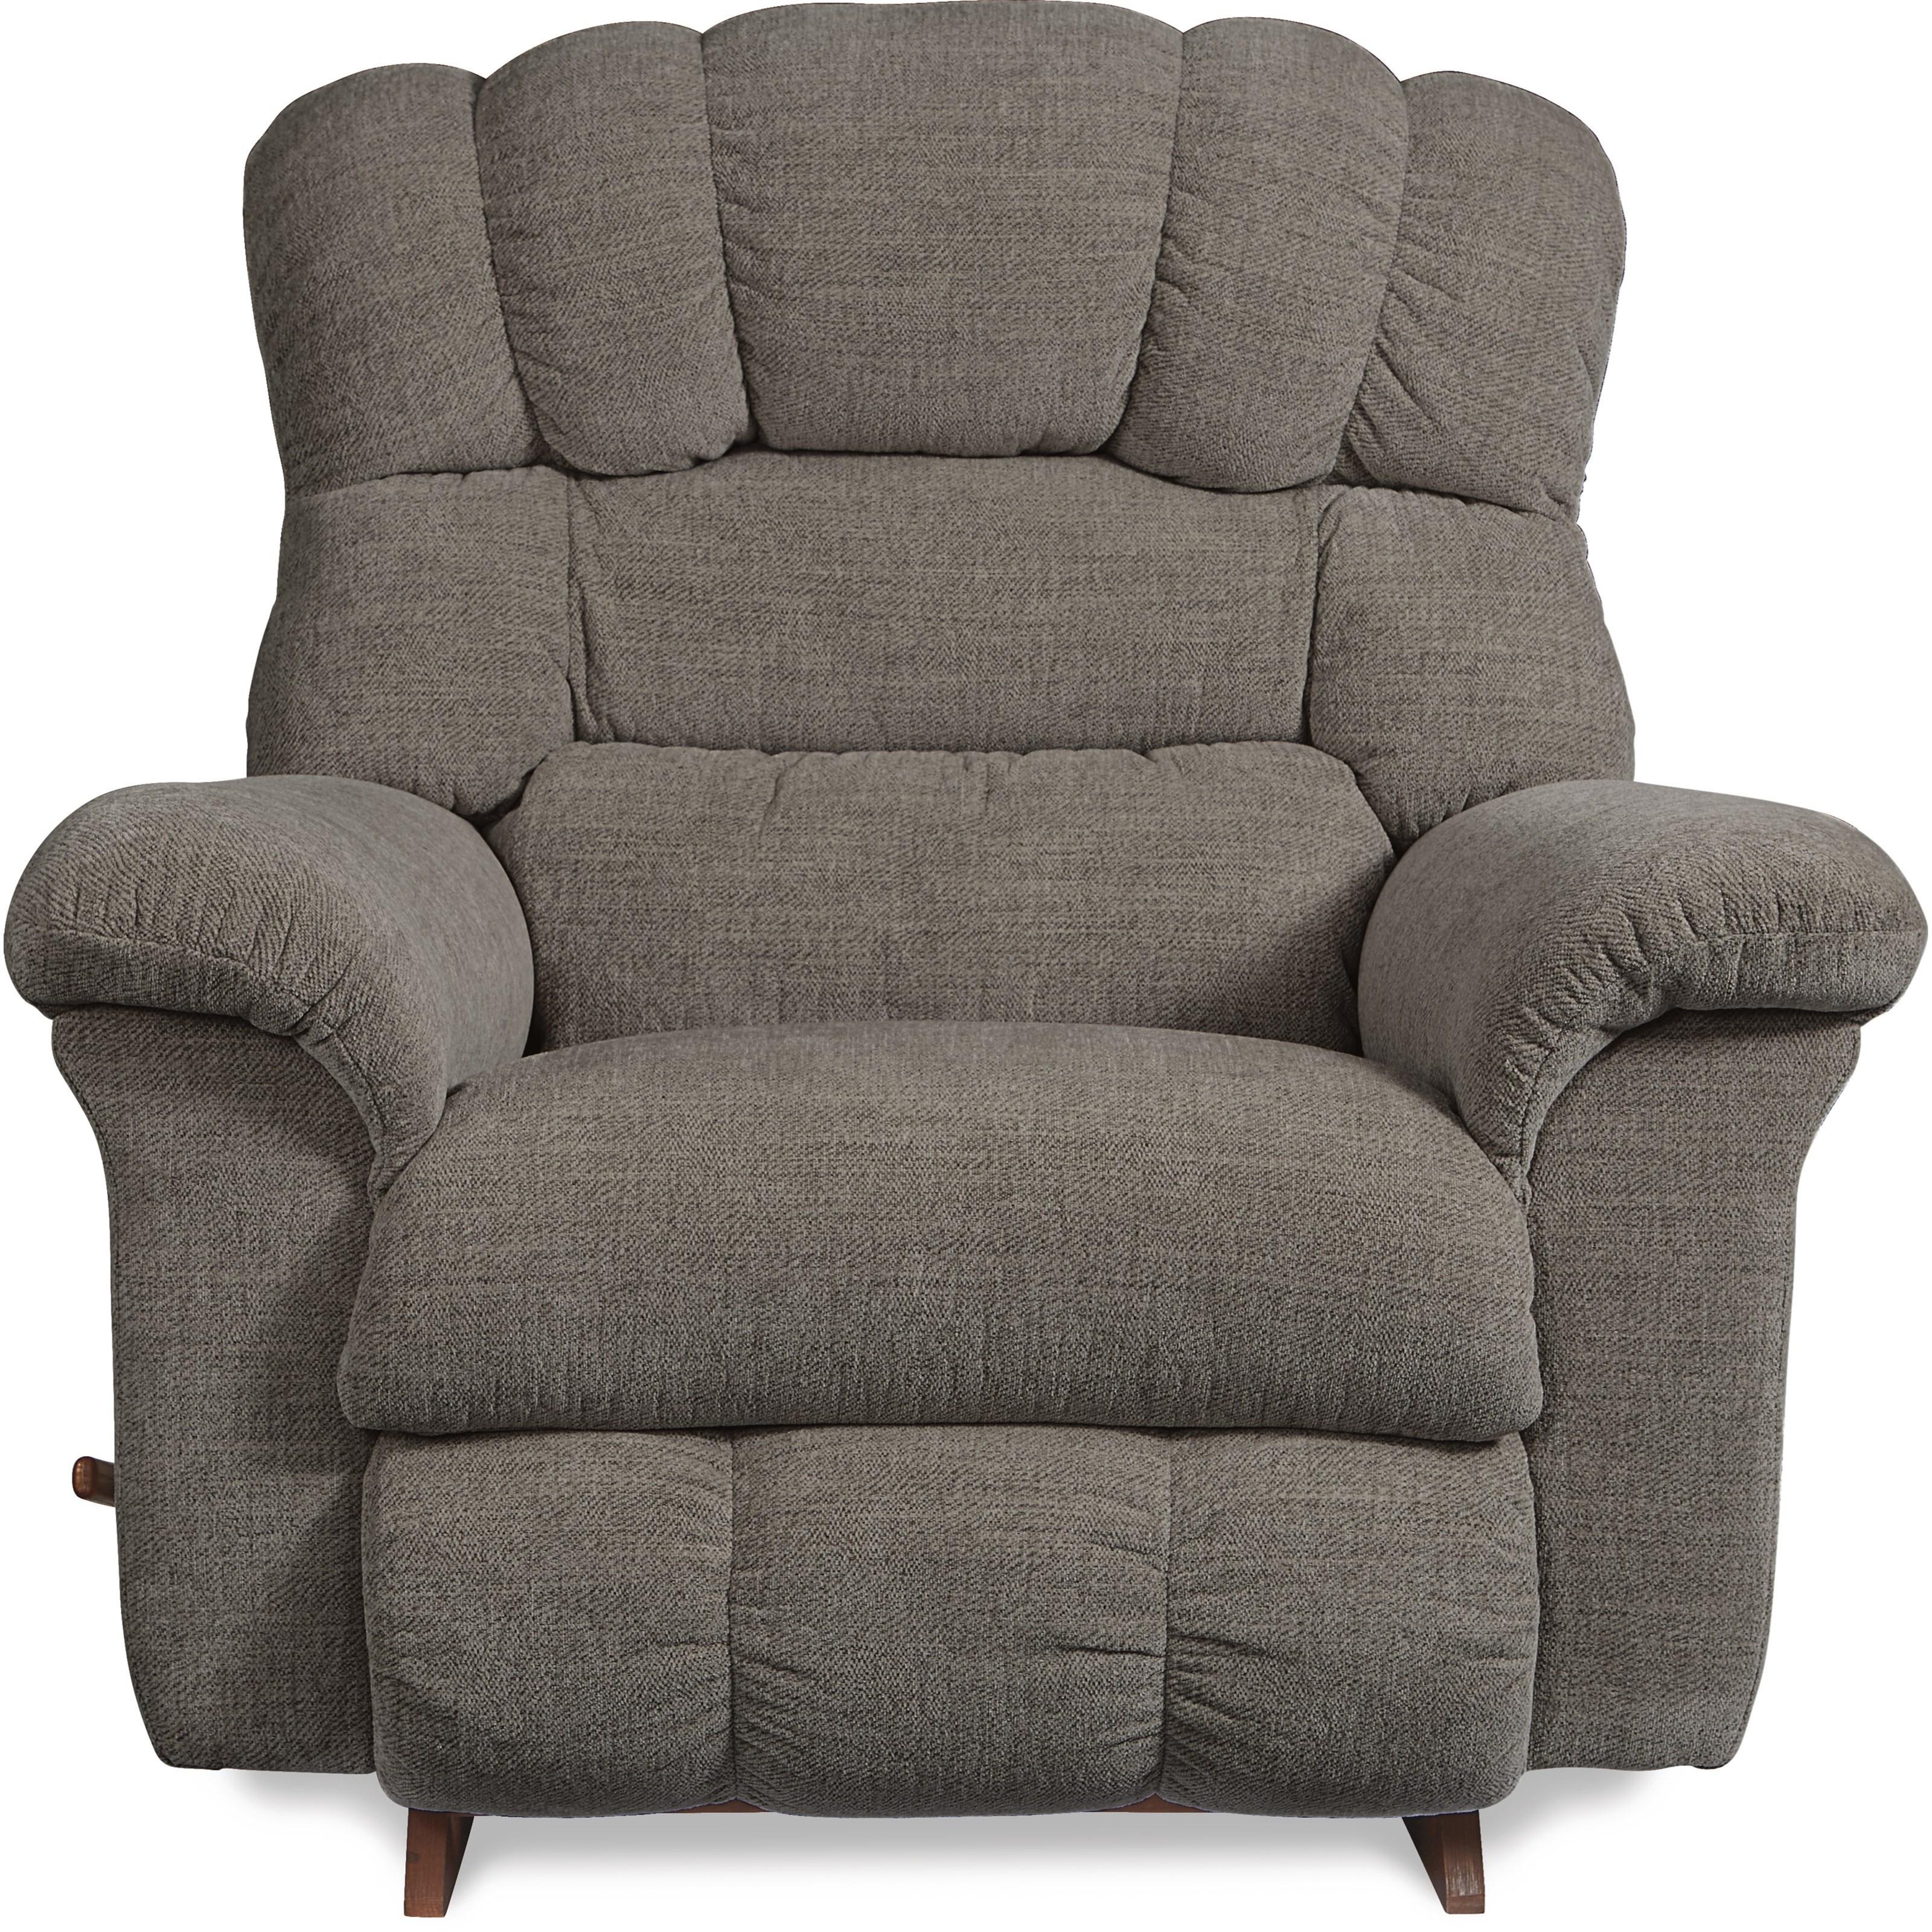 rocker and recliner chair blue velvet accent la z boy crandell reclina reclining vandrie home by